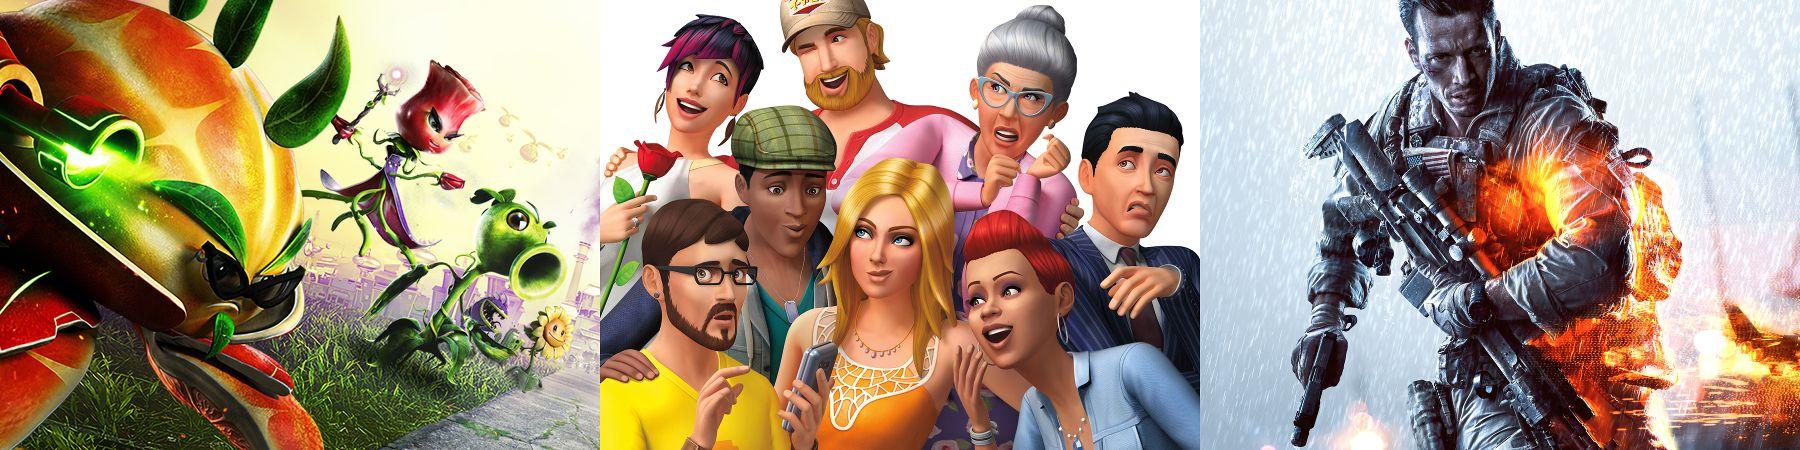 free games download u0026 play free pc games origin